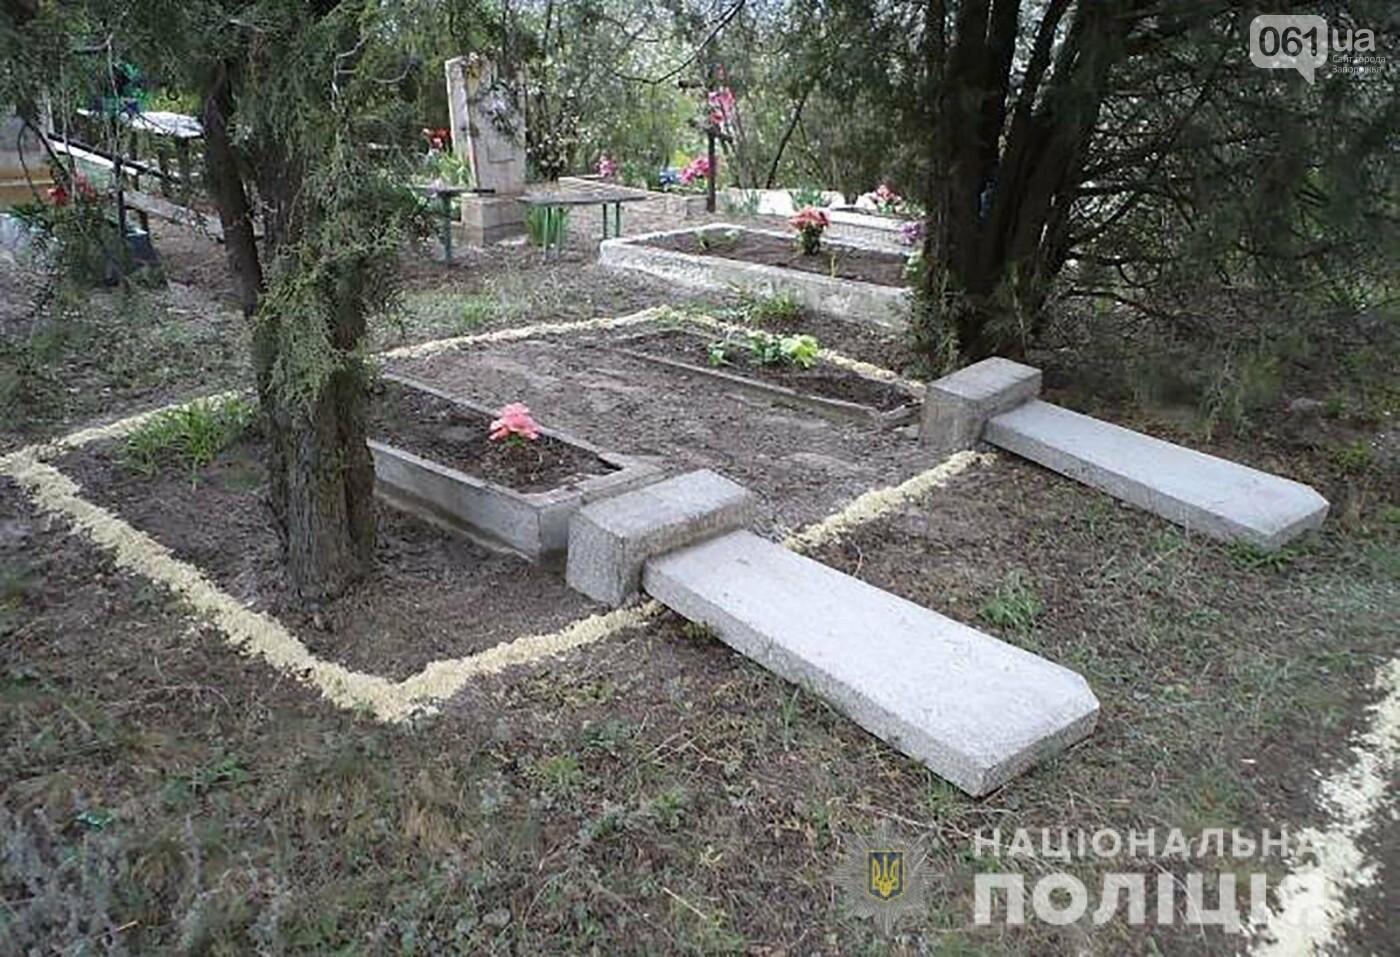 В Запорожской области 13-летний подросток разгромил три десятка могил на кладбище, фото-4